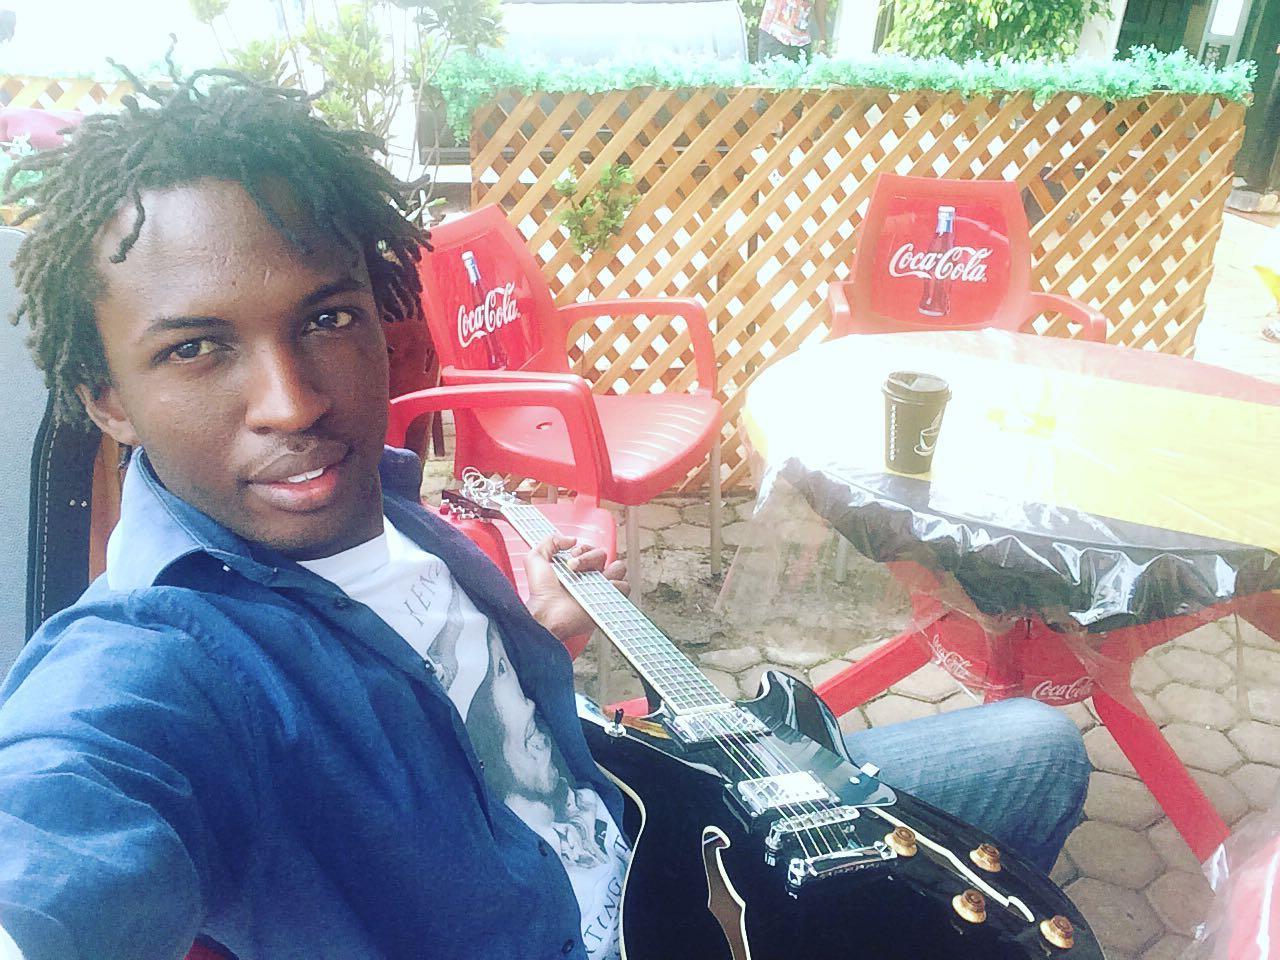 NGANJI Photo